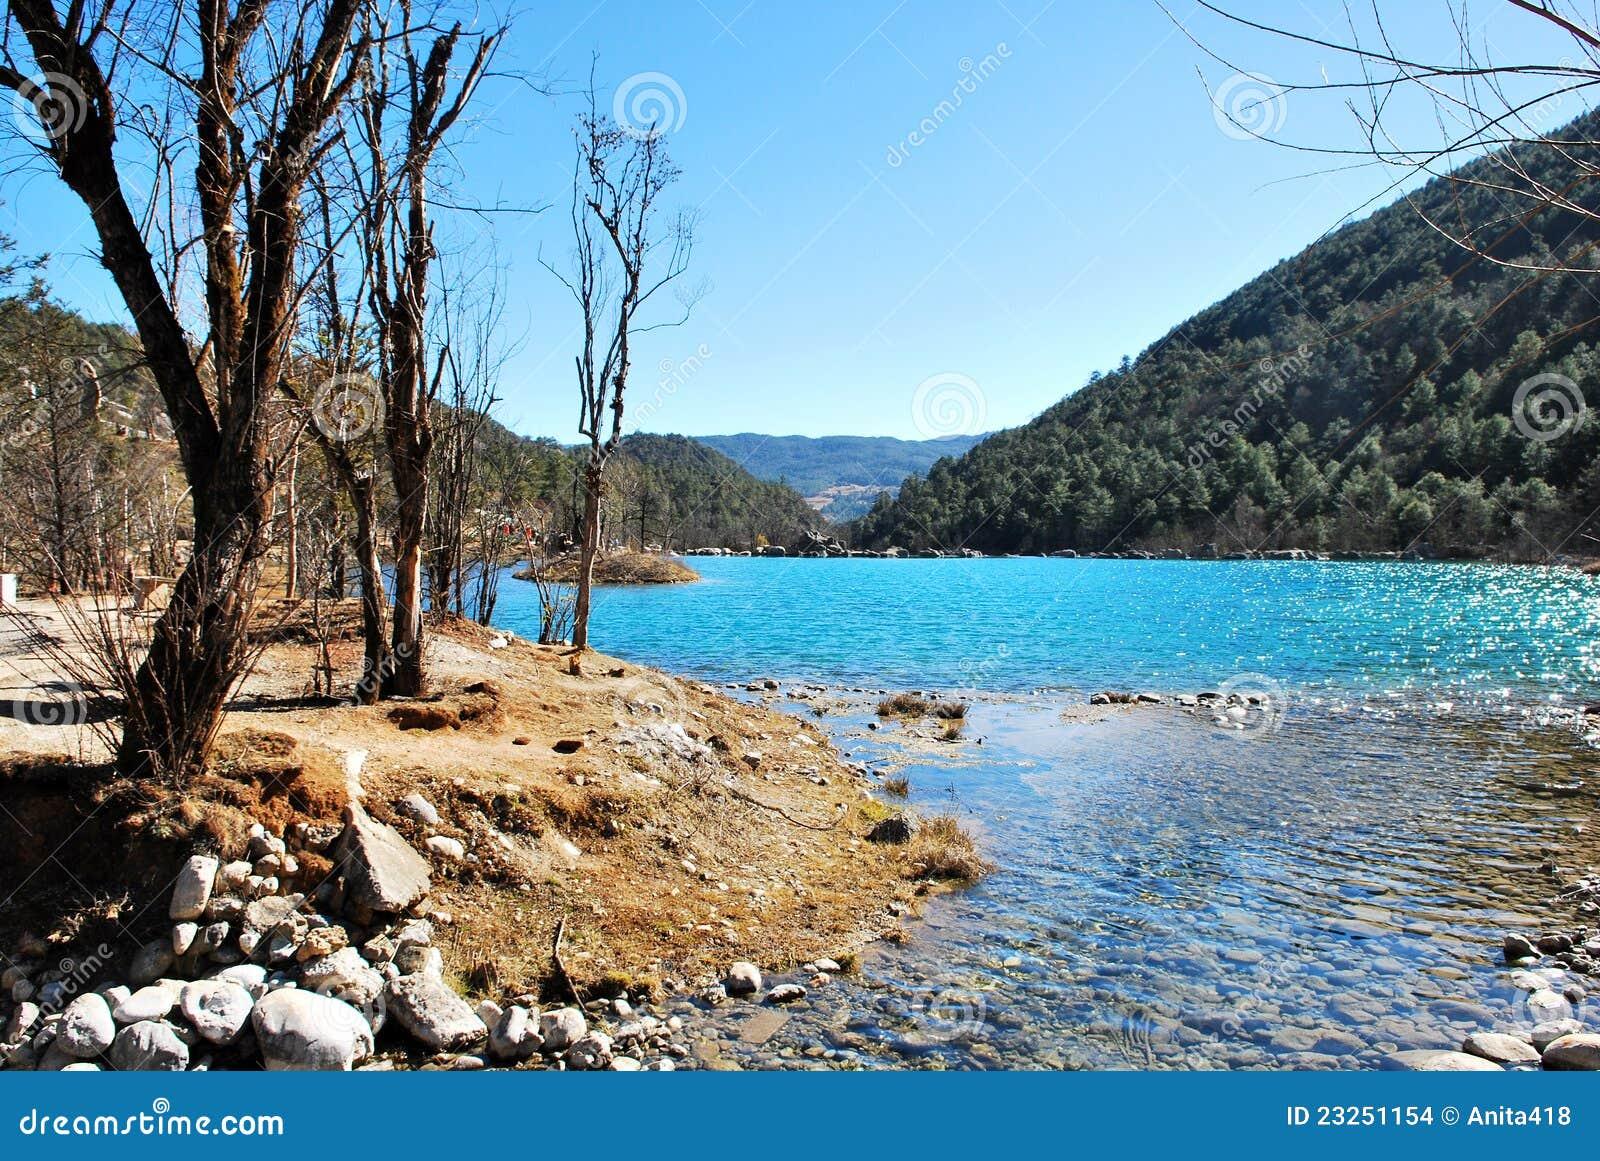 Lake of the Jade Dragon Snow Mountain